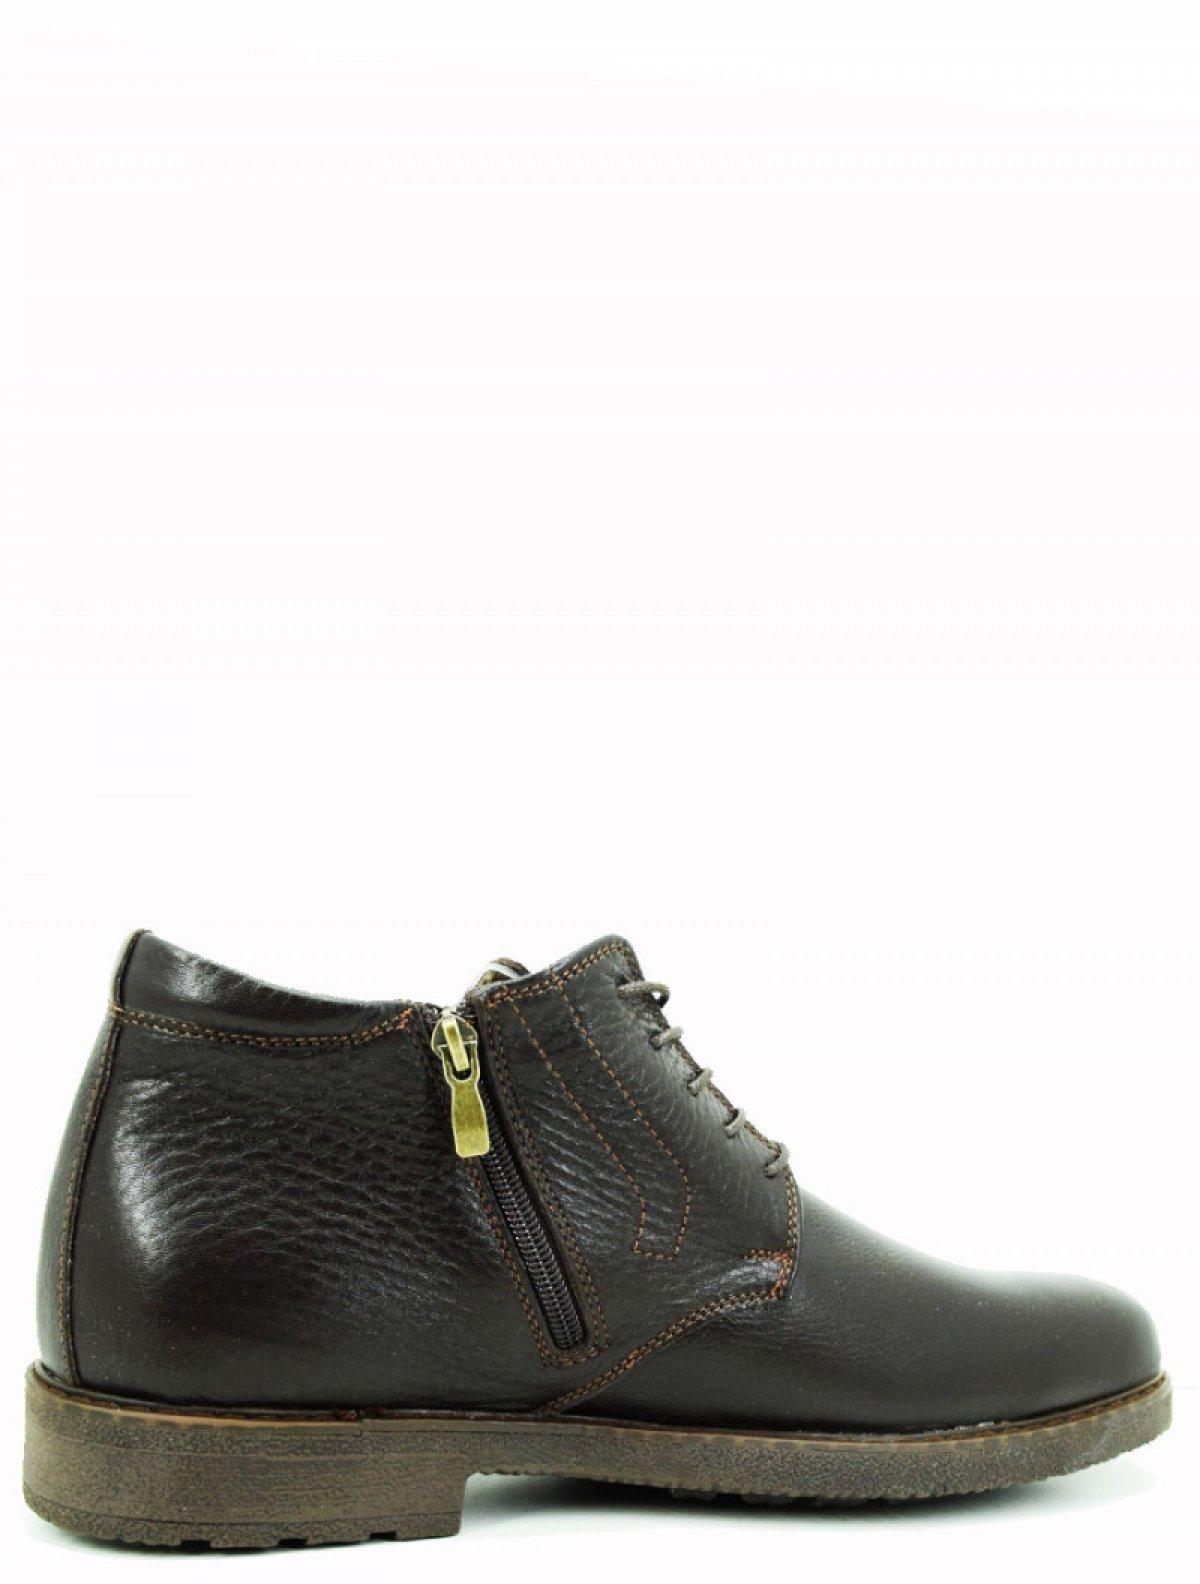 Baratto 6-112-003-2 мужские ботинки